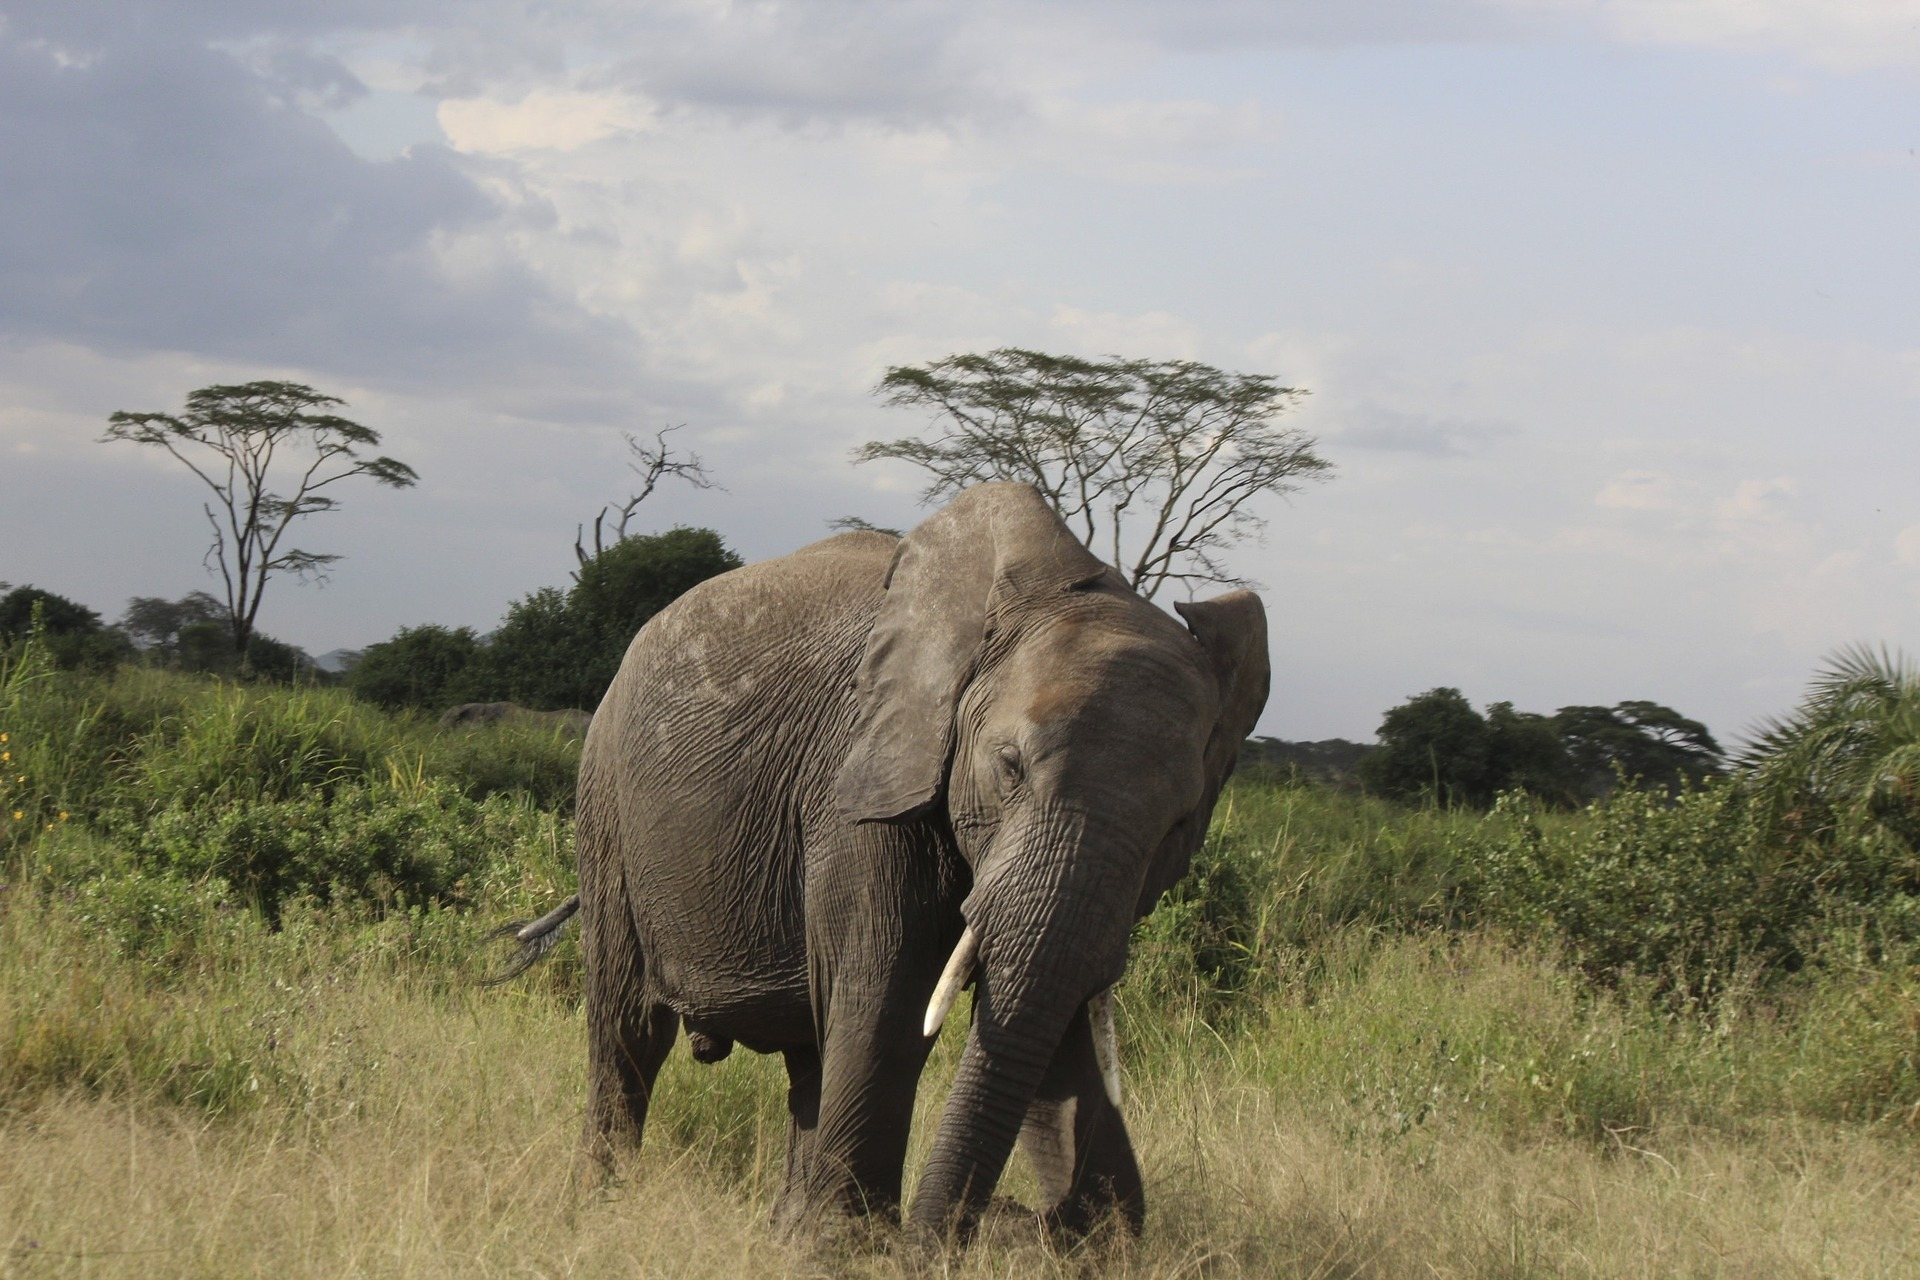 elephant-1127183_1920